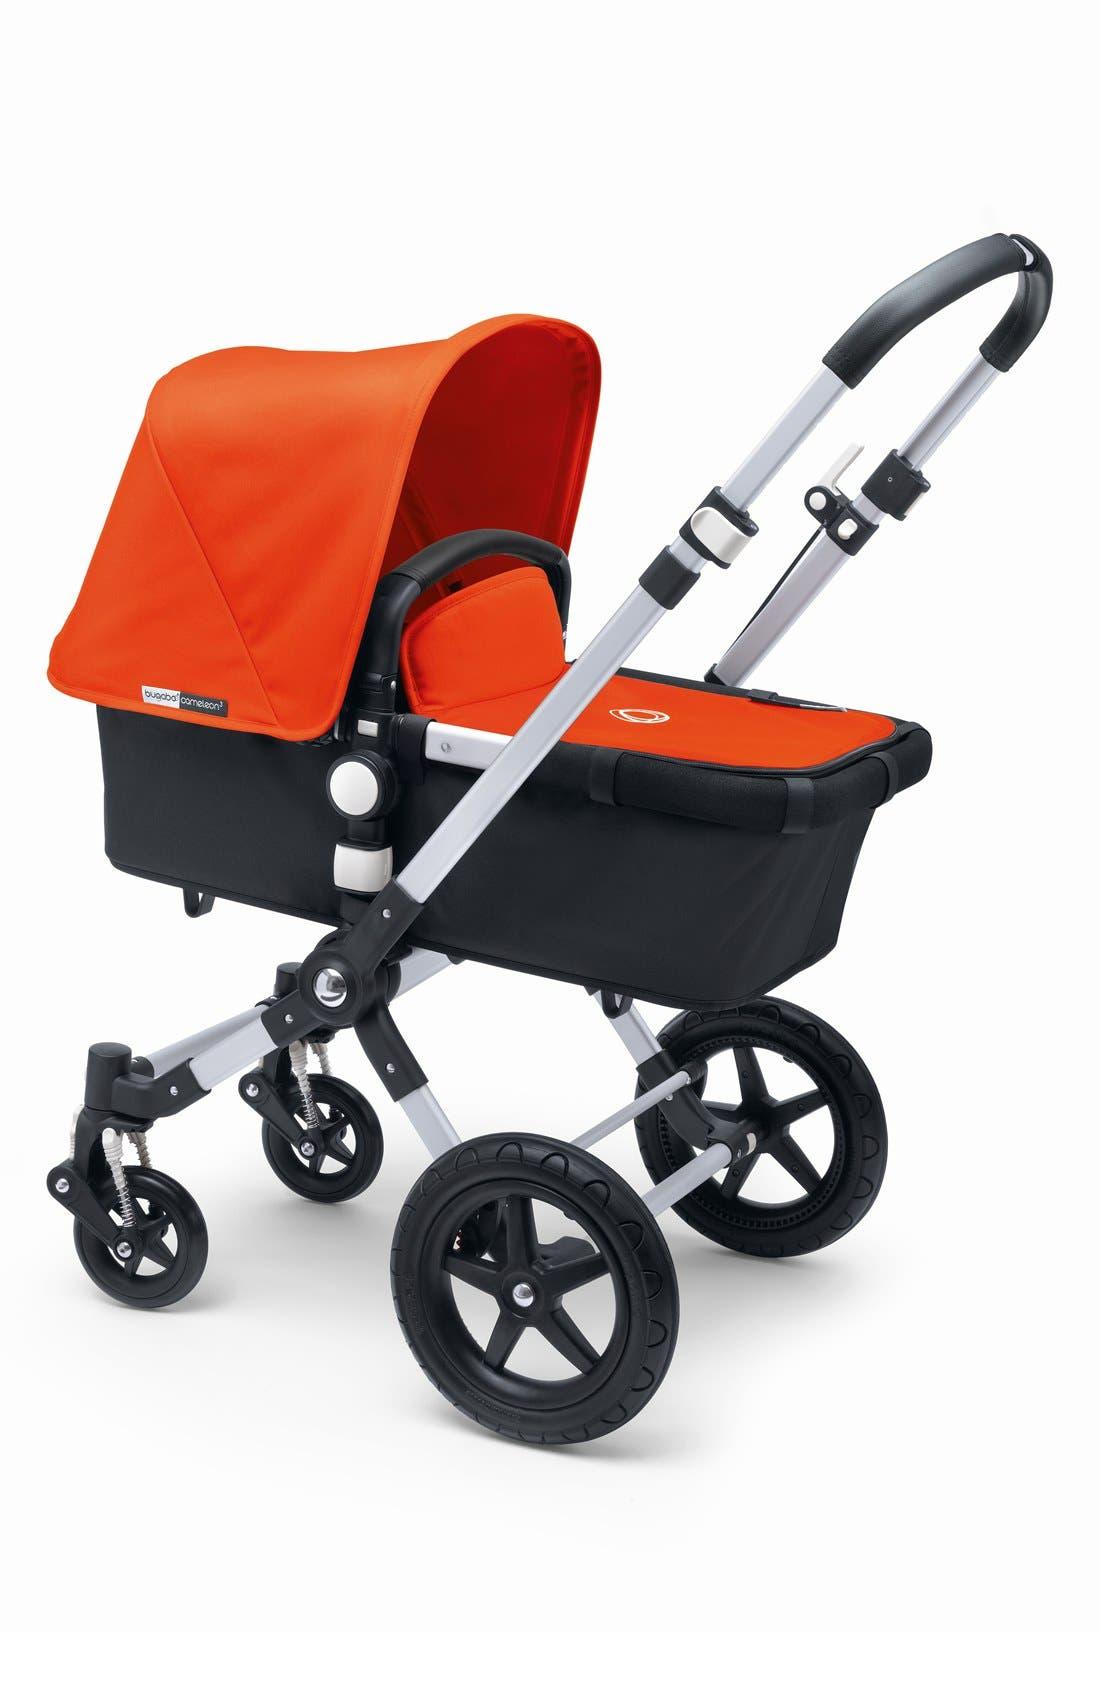 Main Image - Bugaboo Cameleon³ Stroller